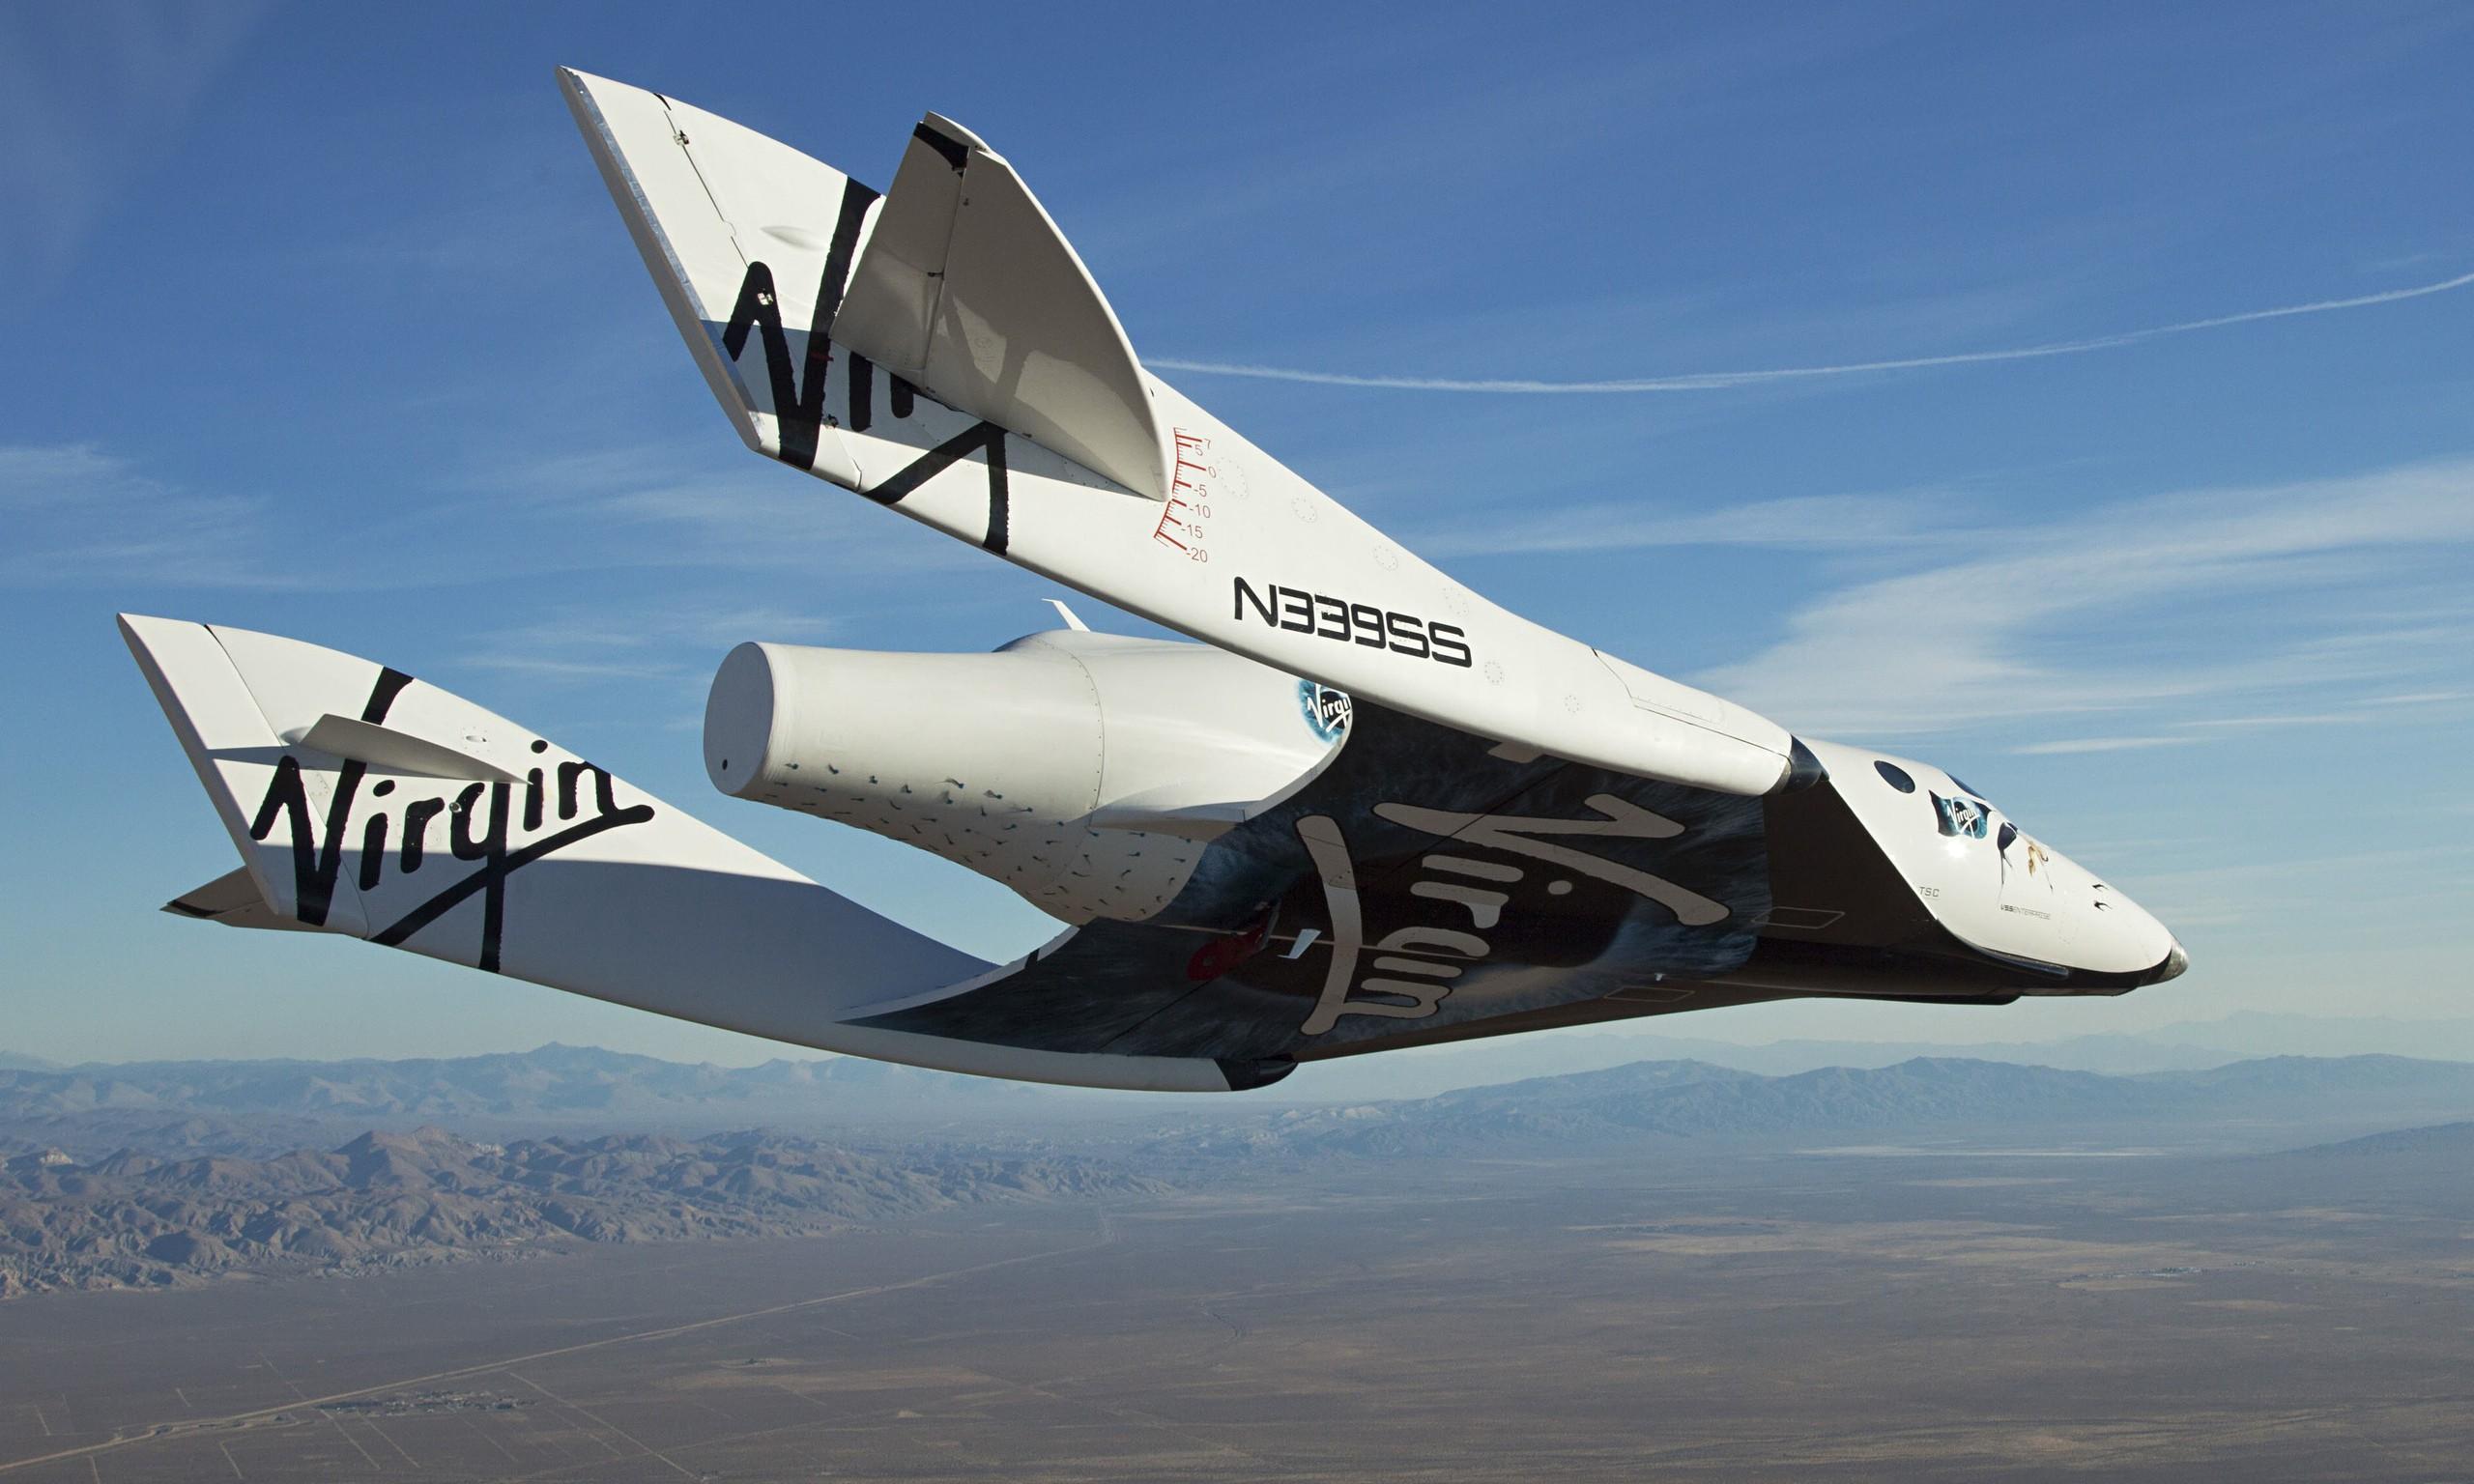 Virgin Galactic's SpaceShipTwo in flight above the Mojave Desert